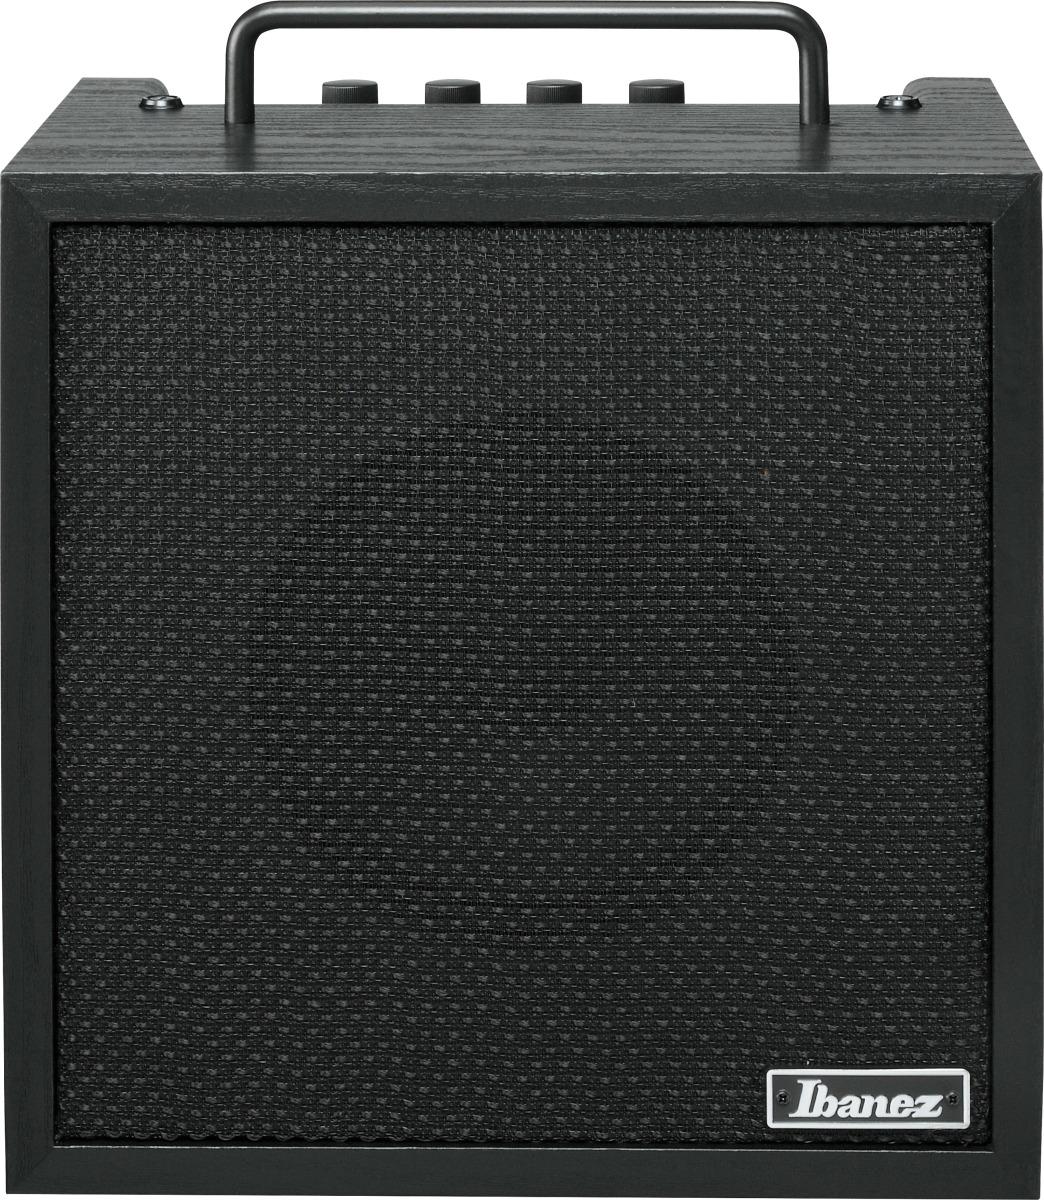 Ibanez / IBZ10B V2 小型ベースアンプ【お取り寄せ商品】《予約注文/納期:8月下旬》